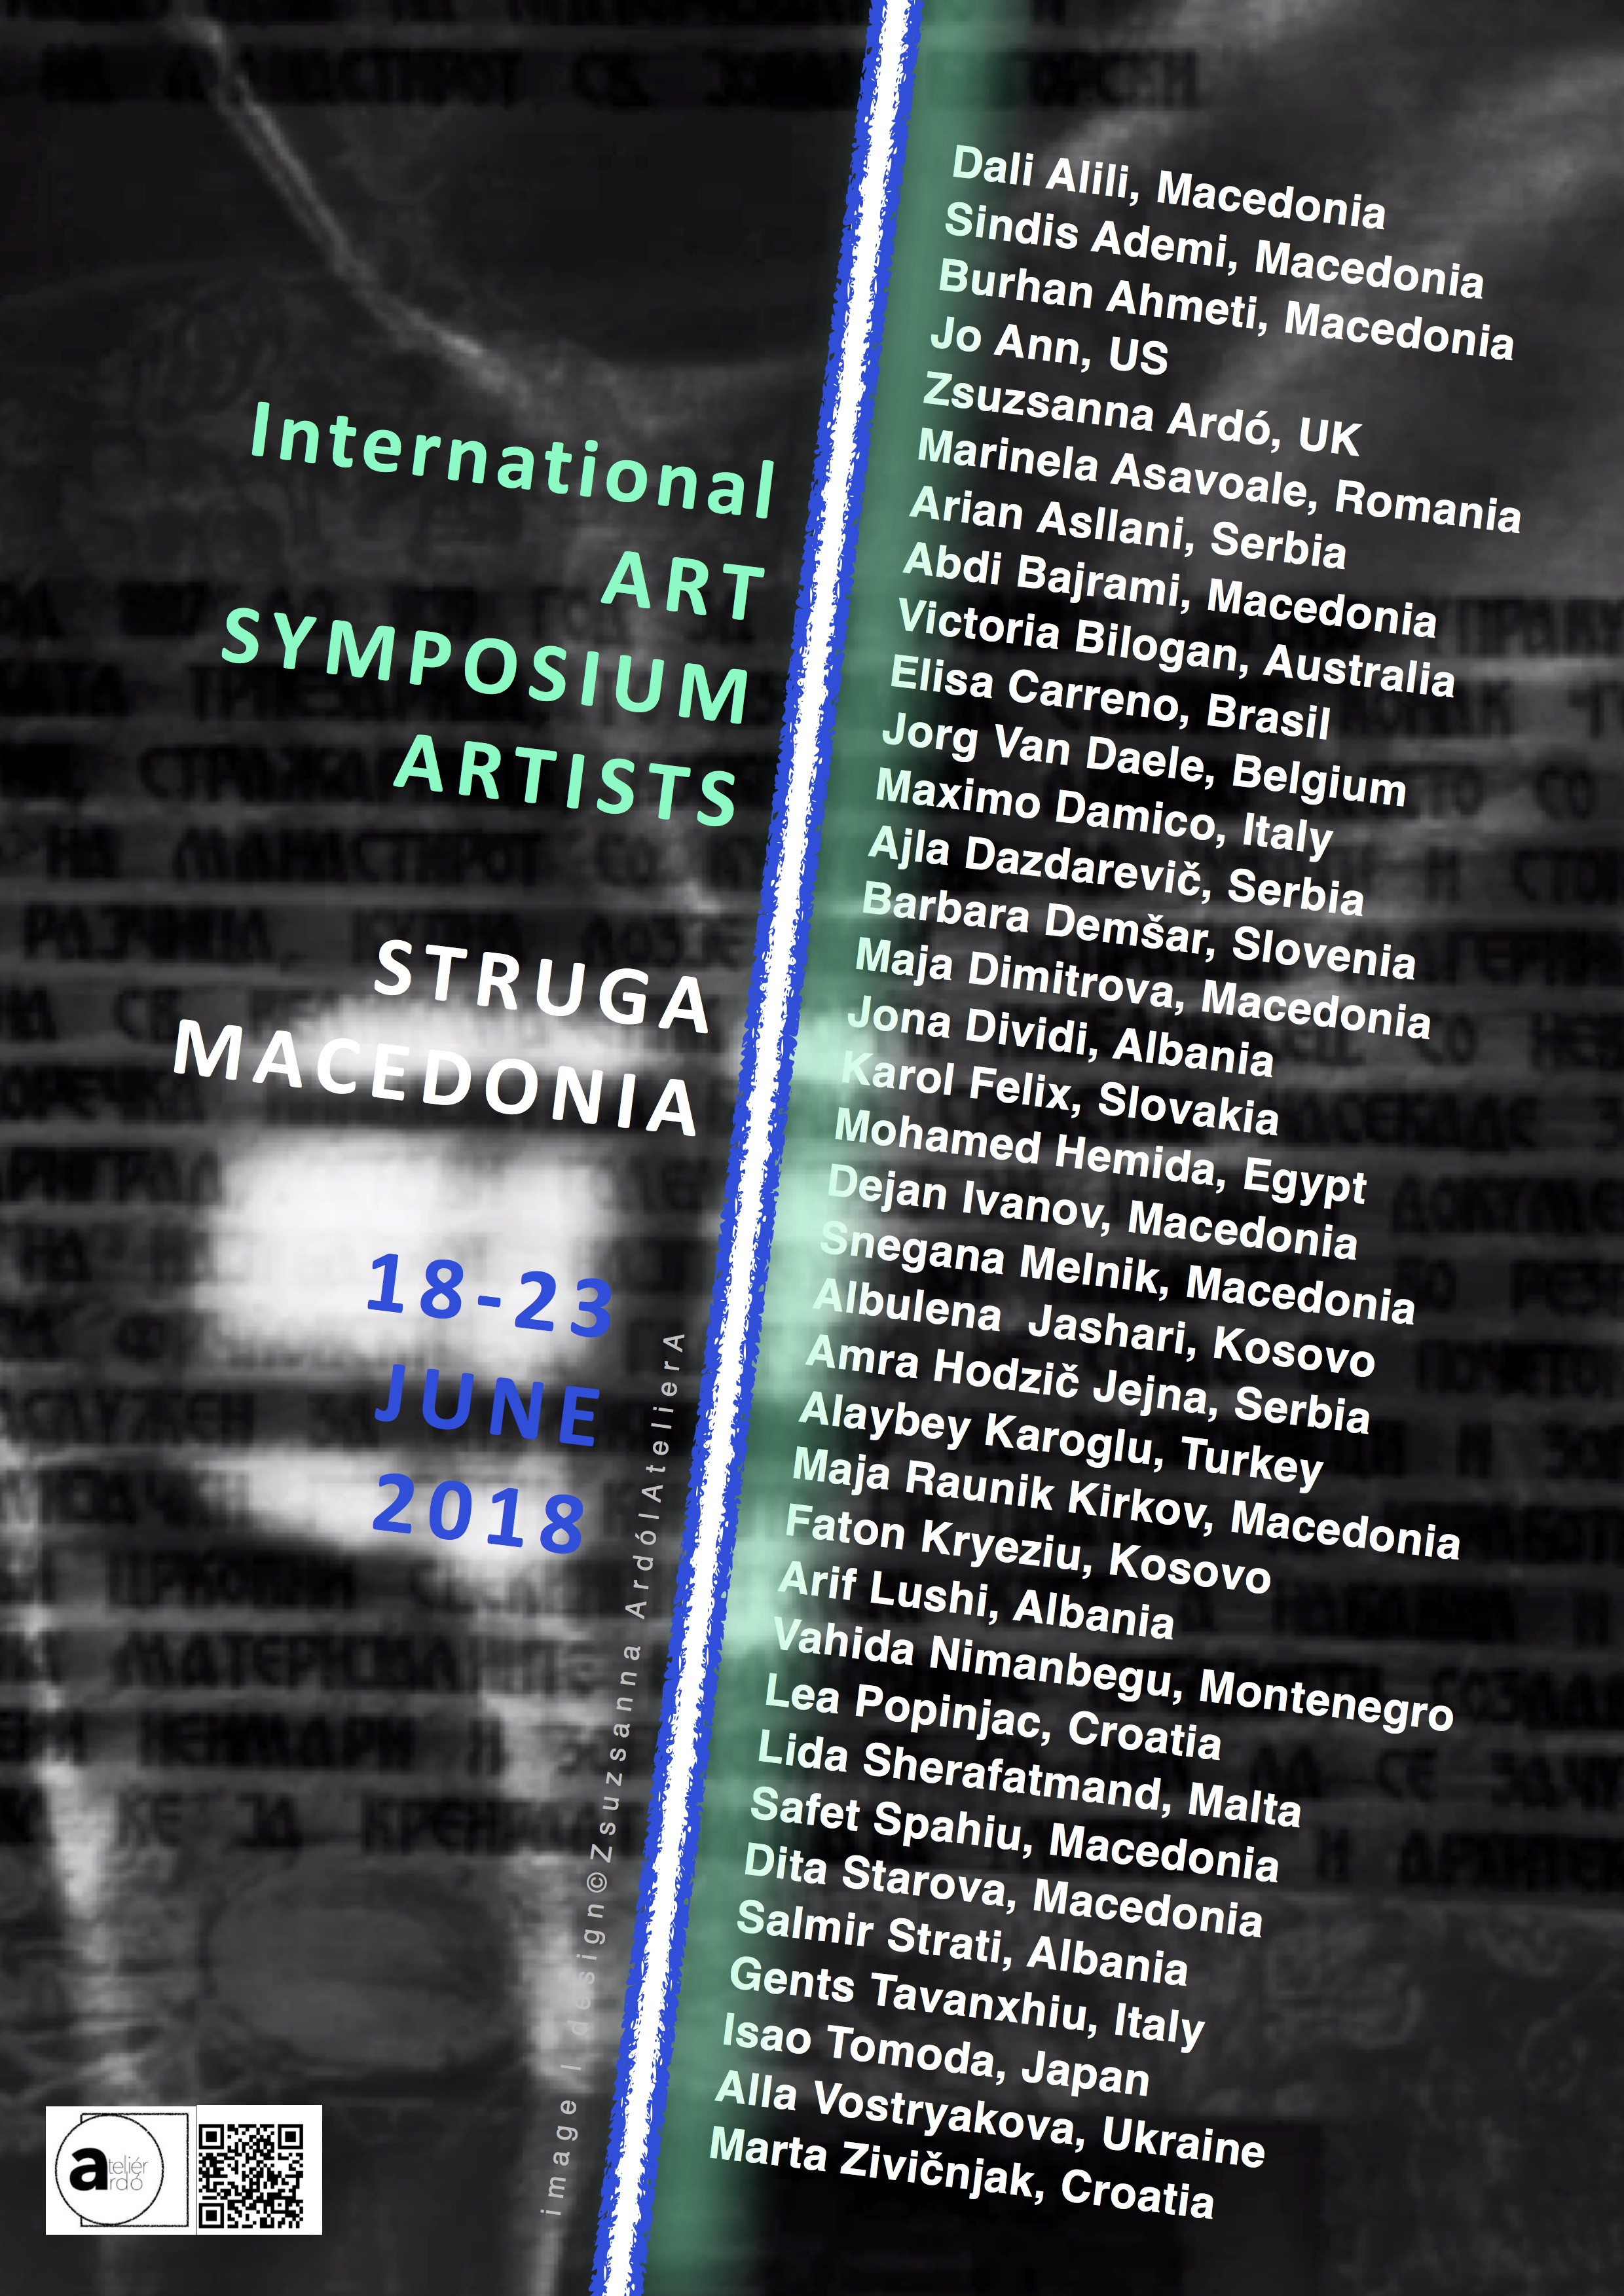 18 MACEdonia Struga AiR art symposium poster©Zsuzsanna Ardó.jpg